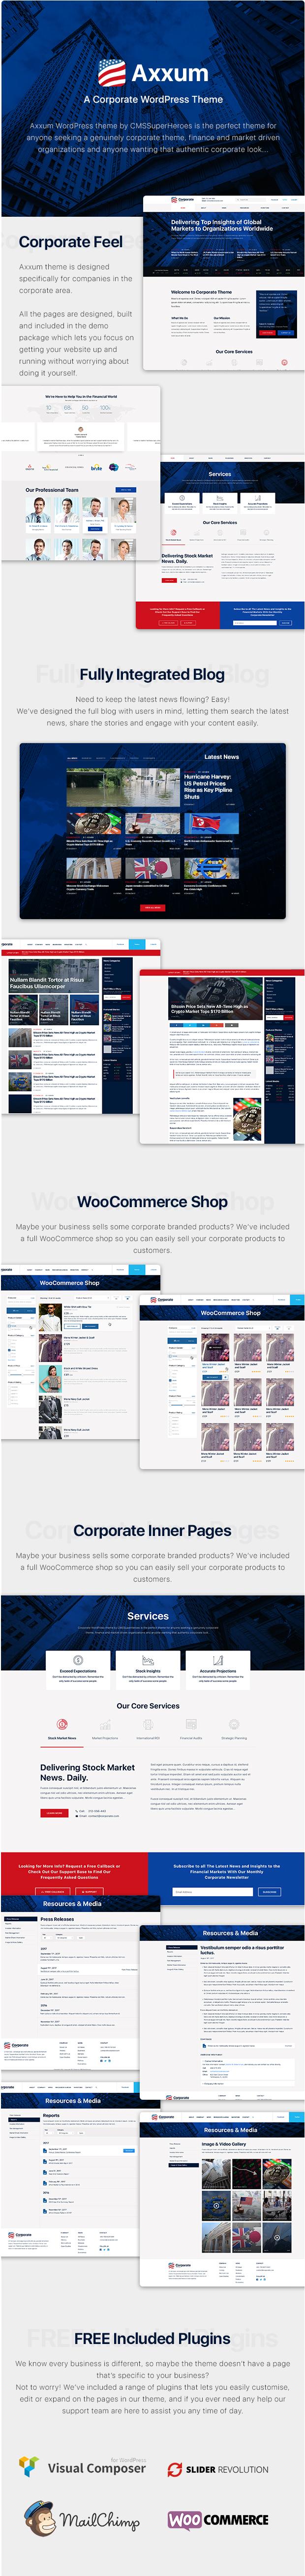 Axxum - Business & Company WordPress Theme